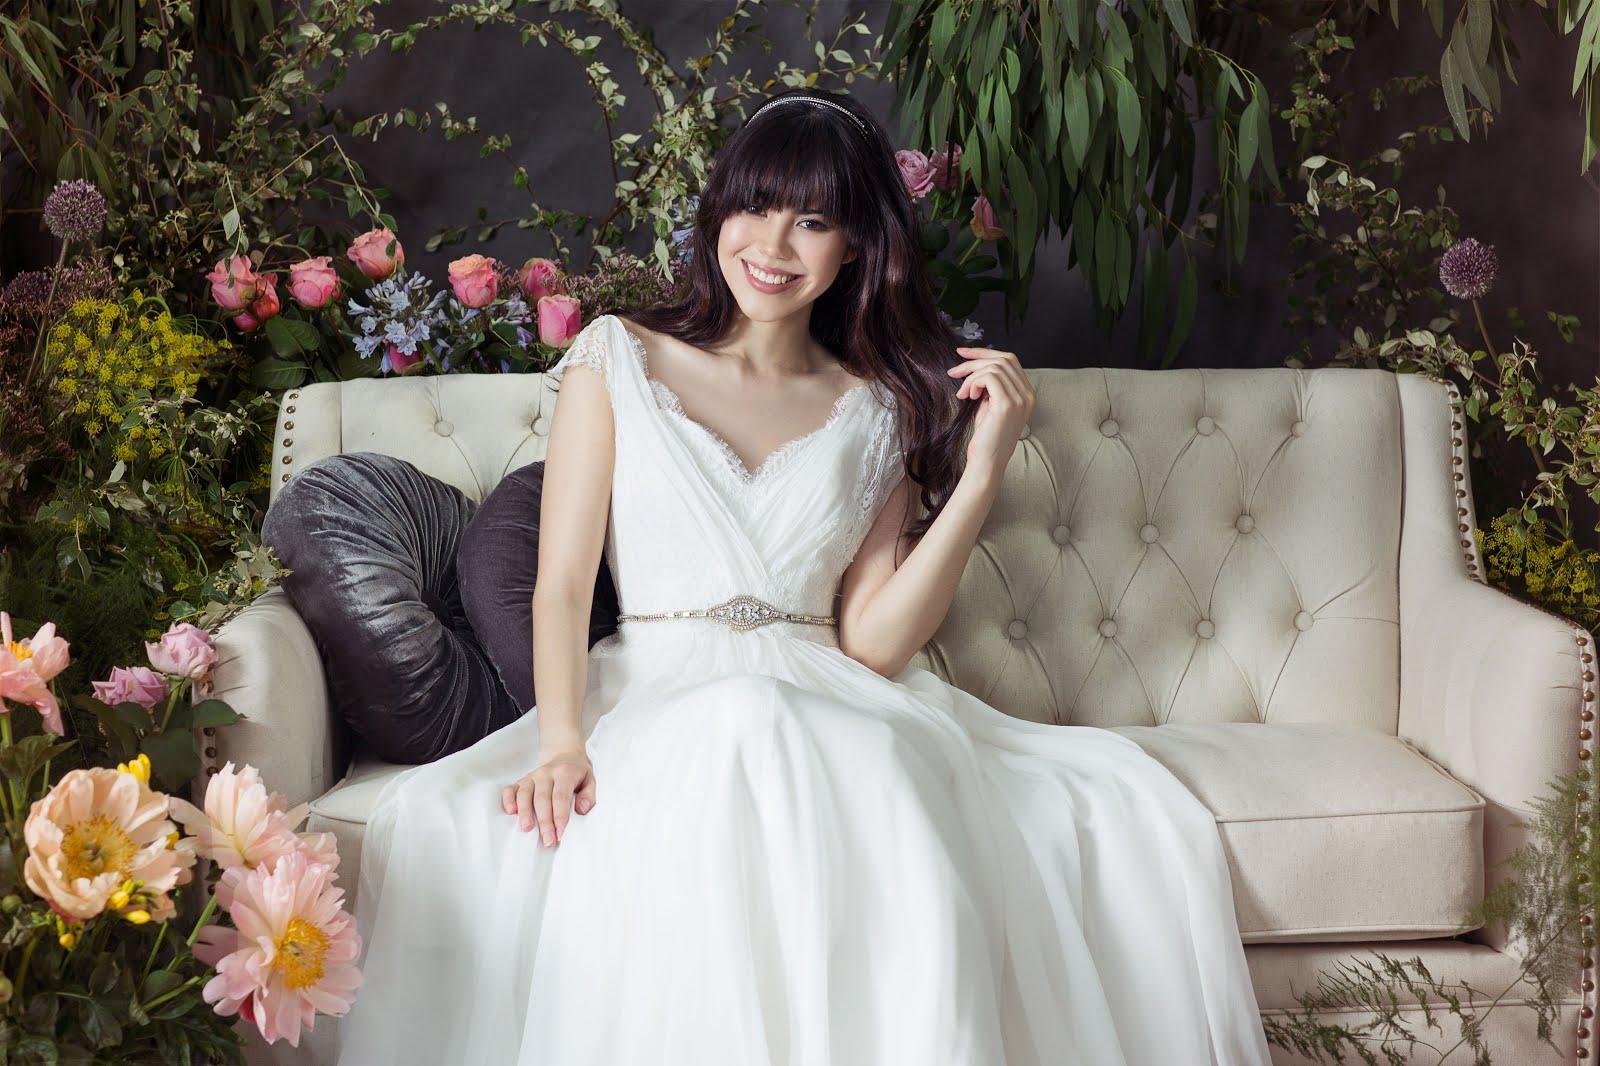 Where To Find A Dress For A Wedding 92 Trend Choosing a wedding dress